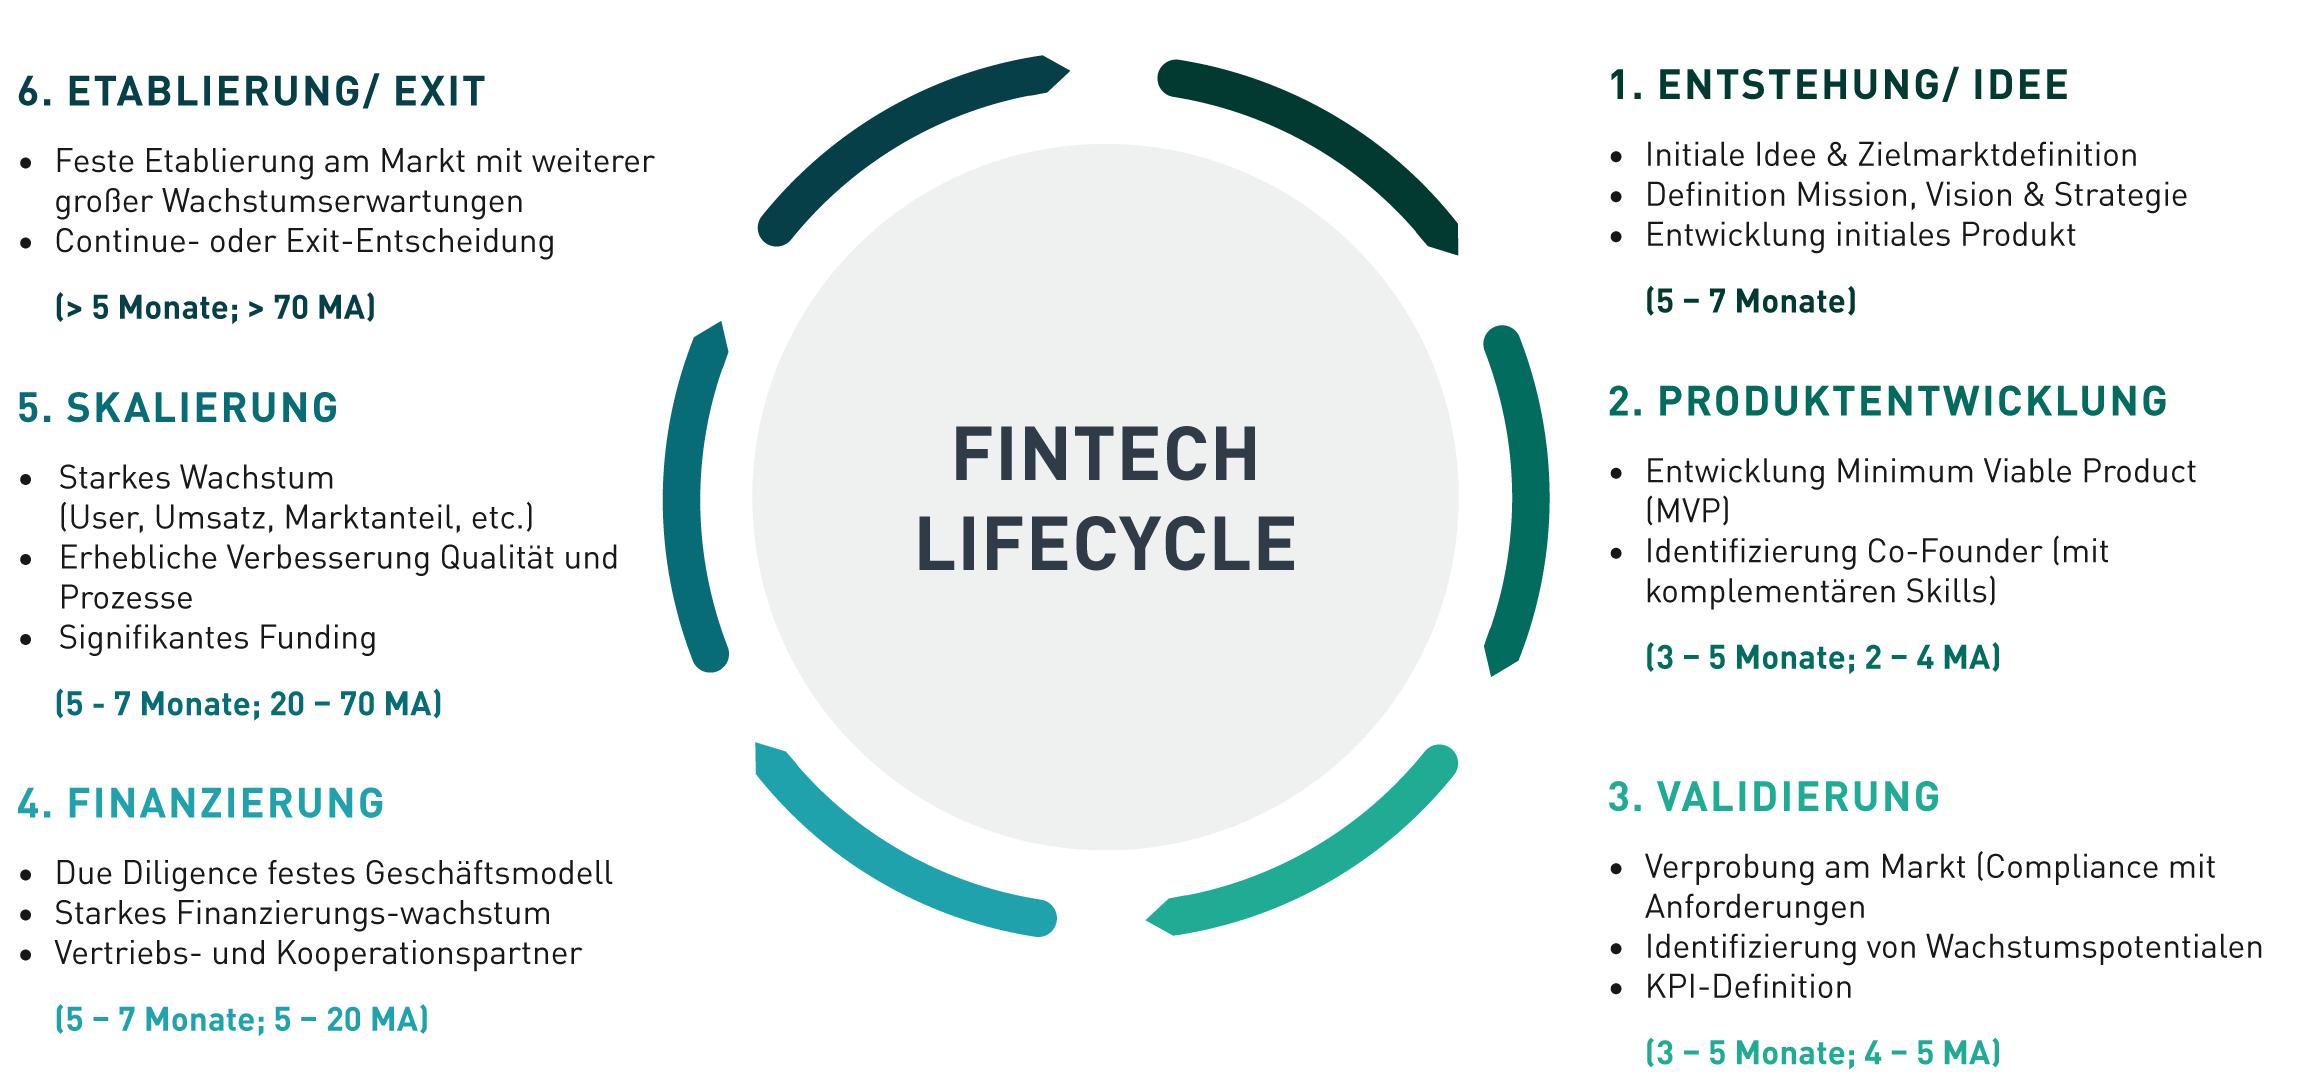 Fintechs Im Spannungsfeld Der Regulatorik | Bankingclub concernant Musique Cycle 2